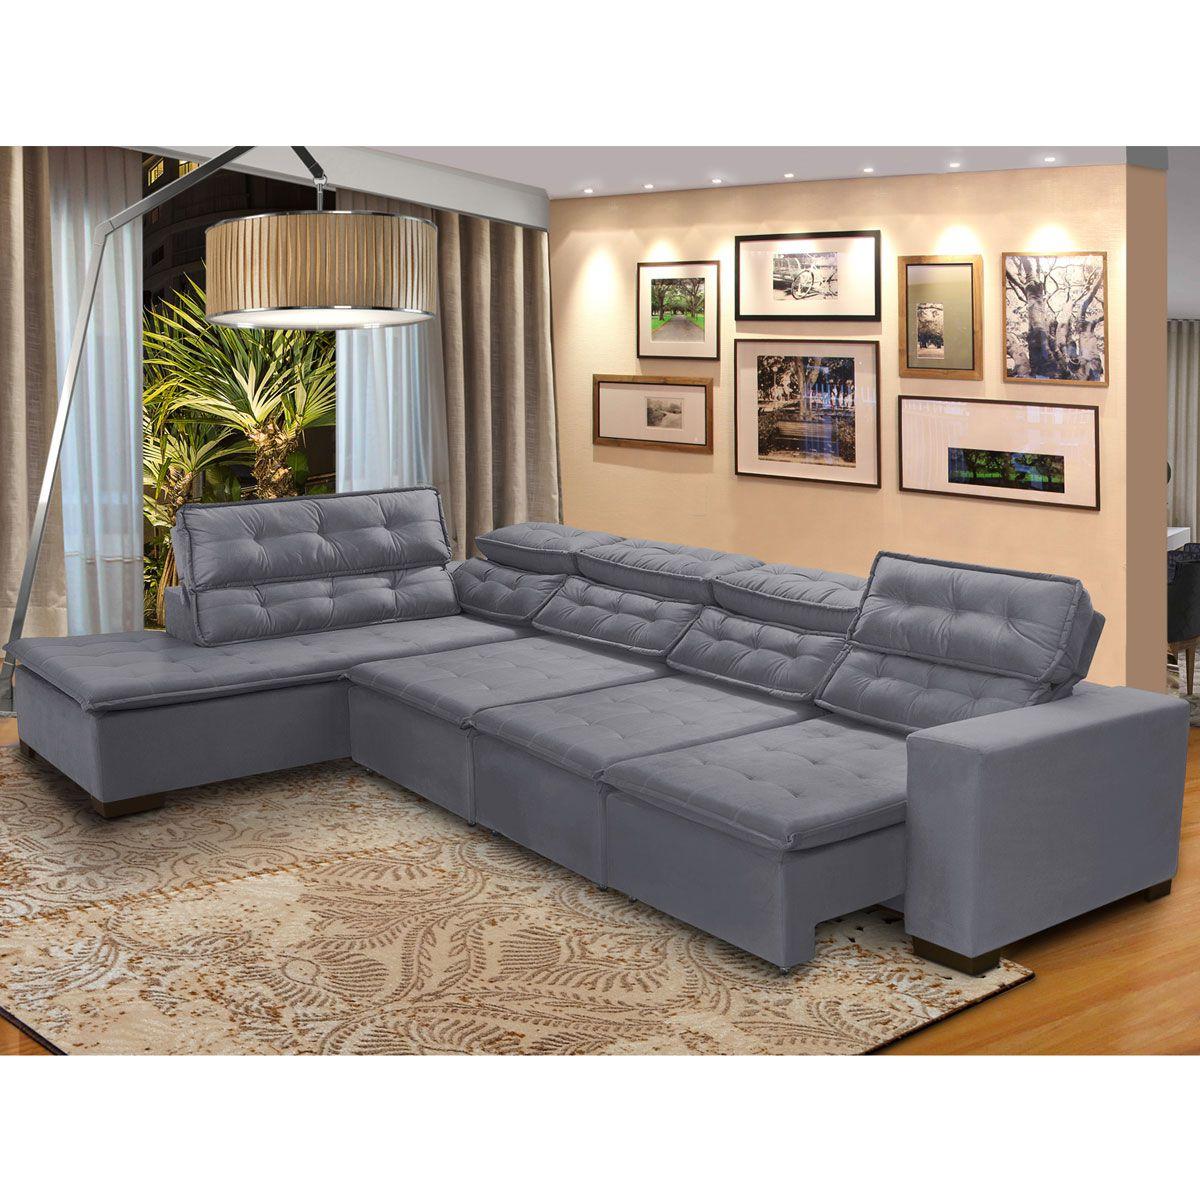 Sofá 7 Lugares de Canto Retrátil Reclinável Pillow Chaise D 3,70 x 2,20 m  Sttilo  Cinza - MegaSul